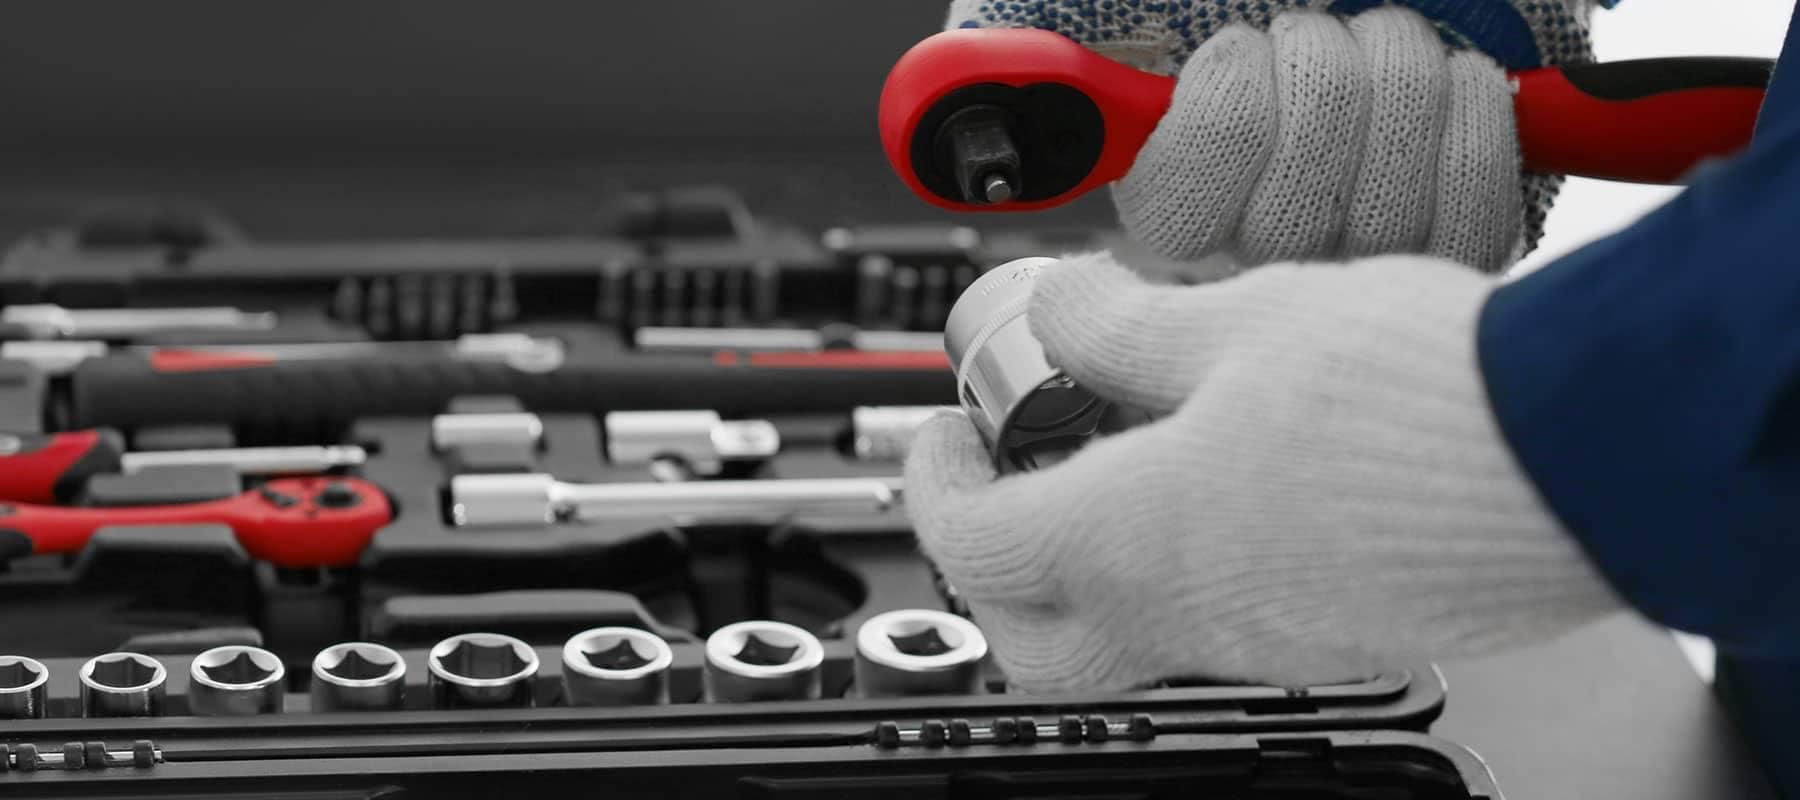 technician using tool